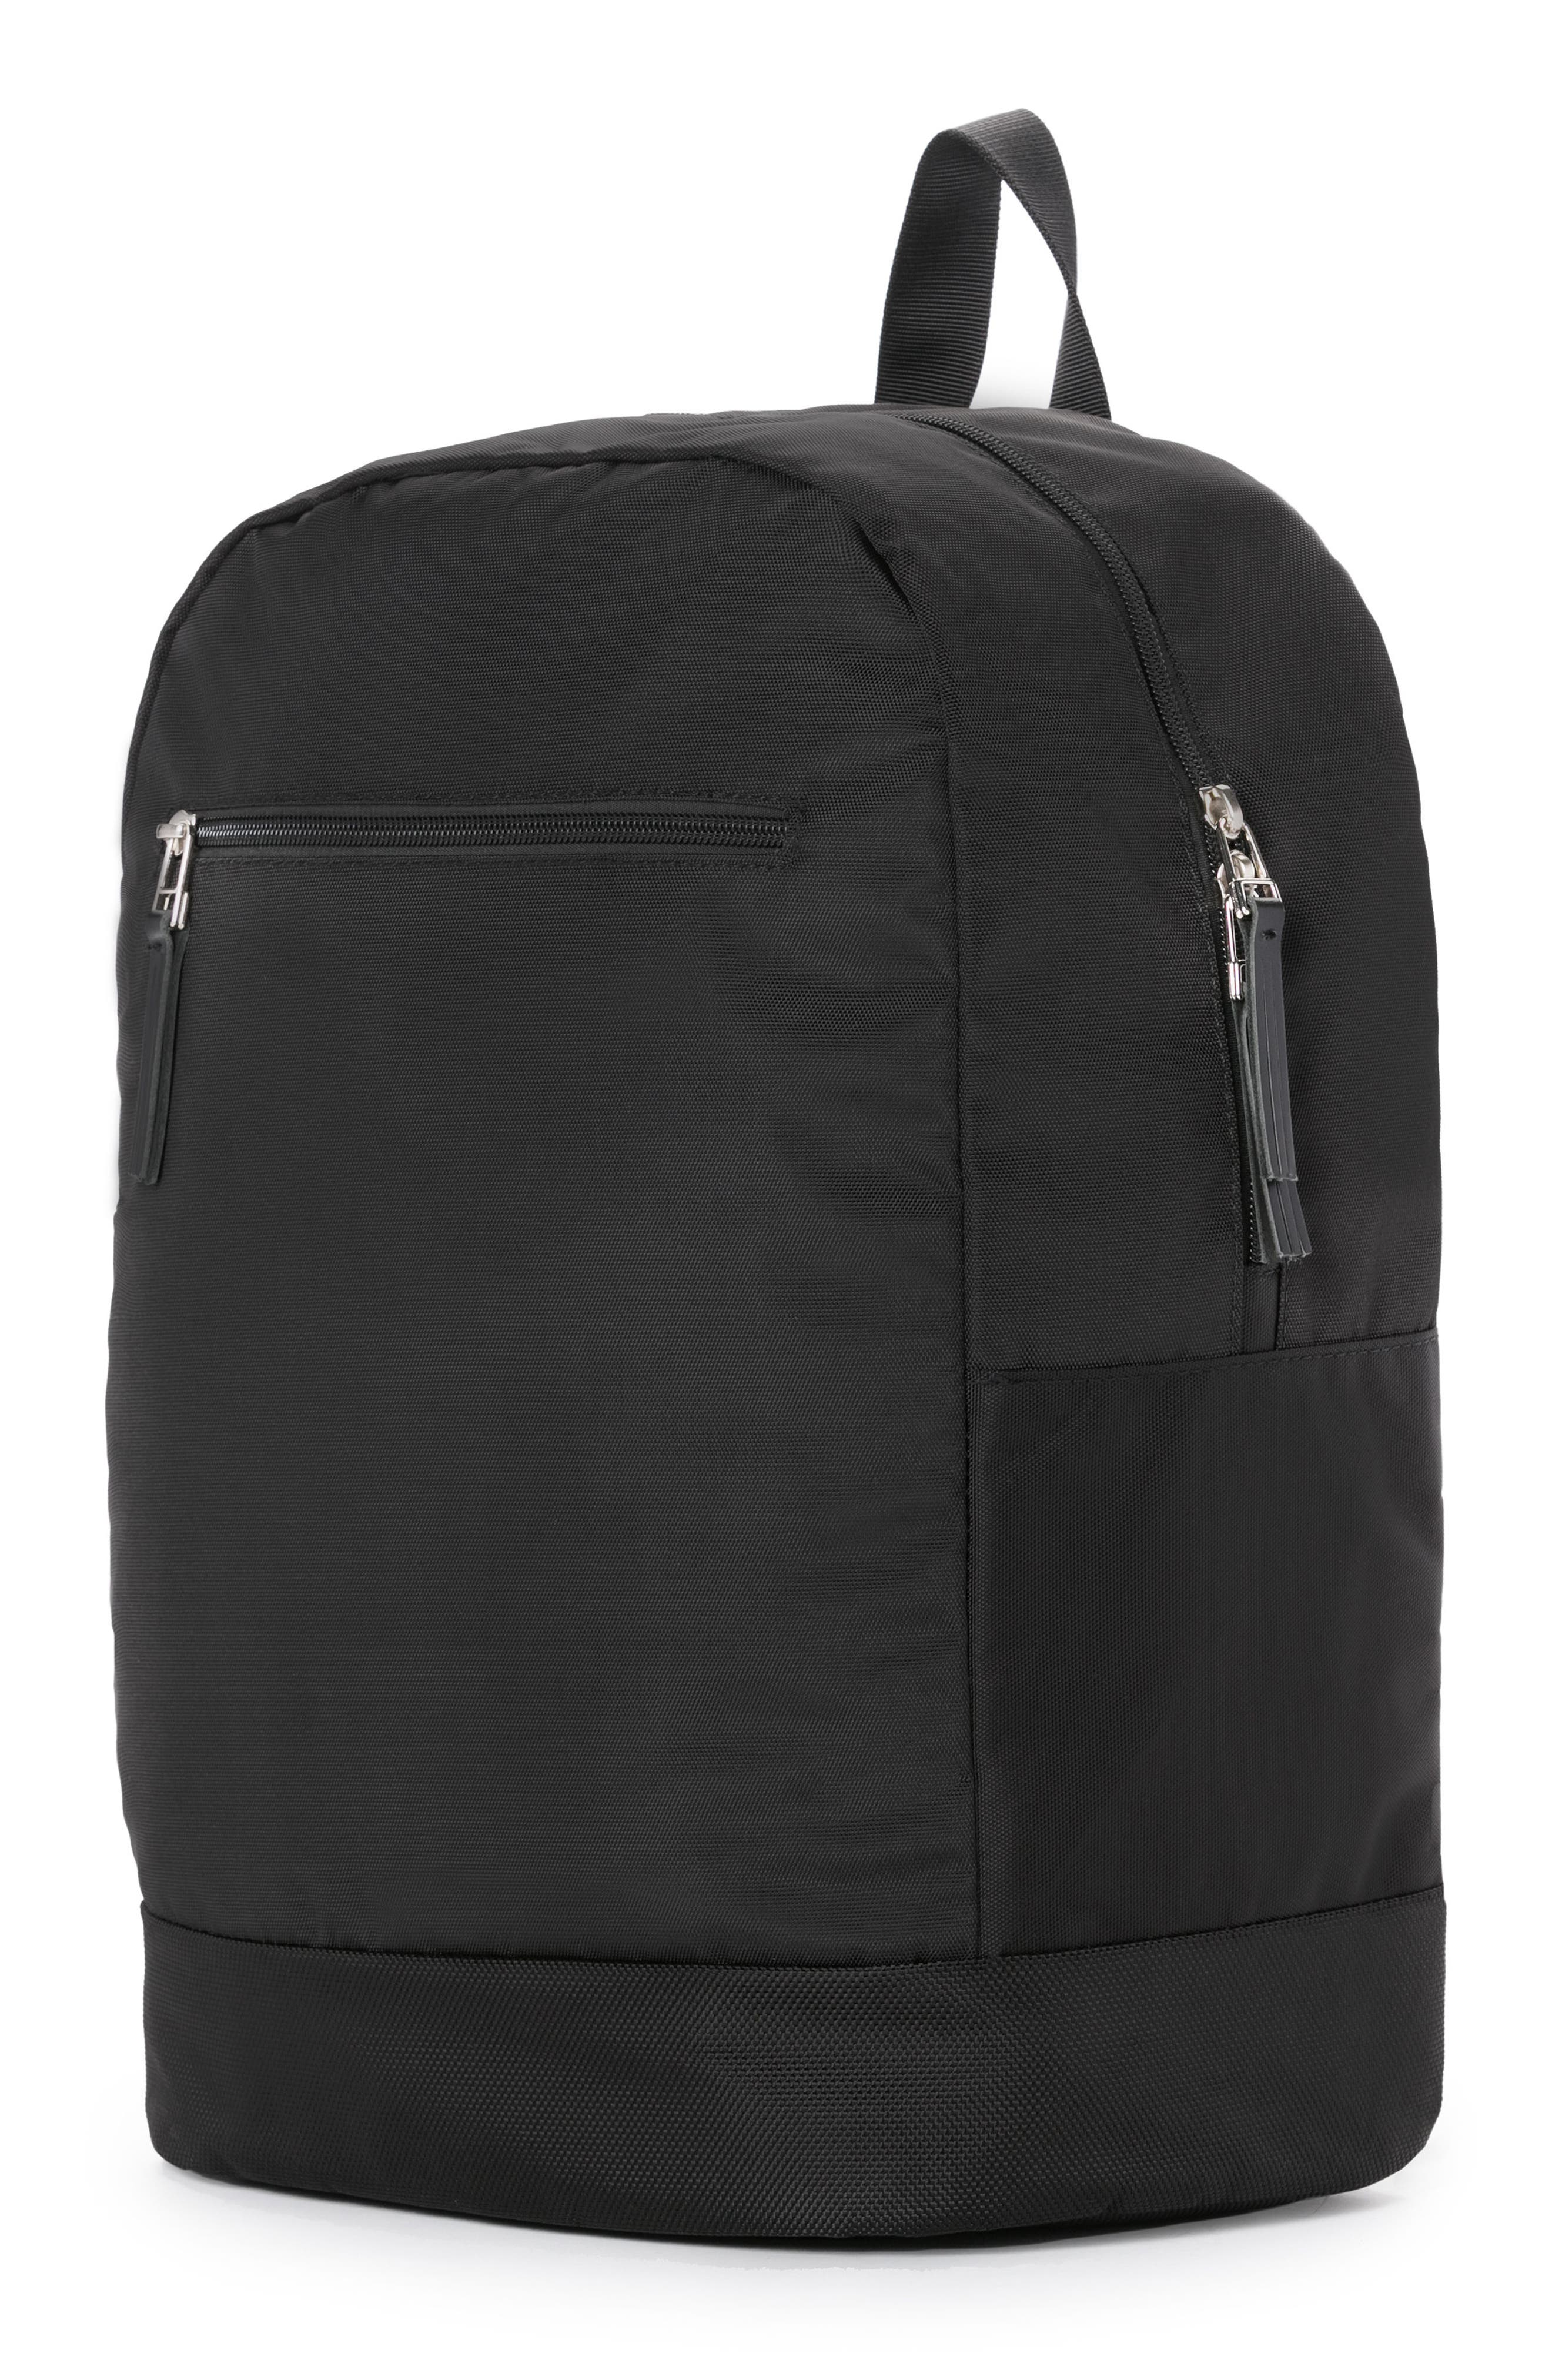 Tomcat Backpack,                             Alternate thumbnail 4, color,                             Black